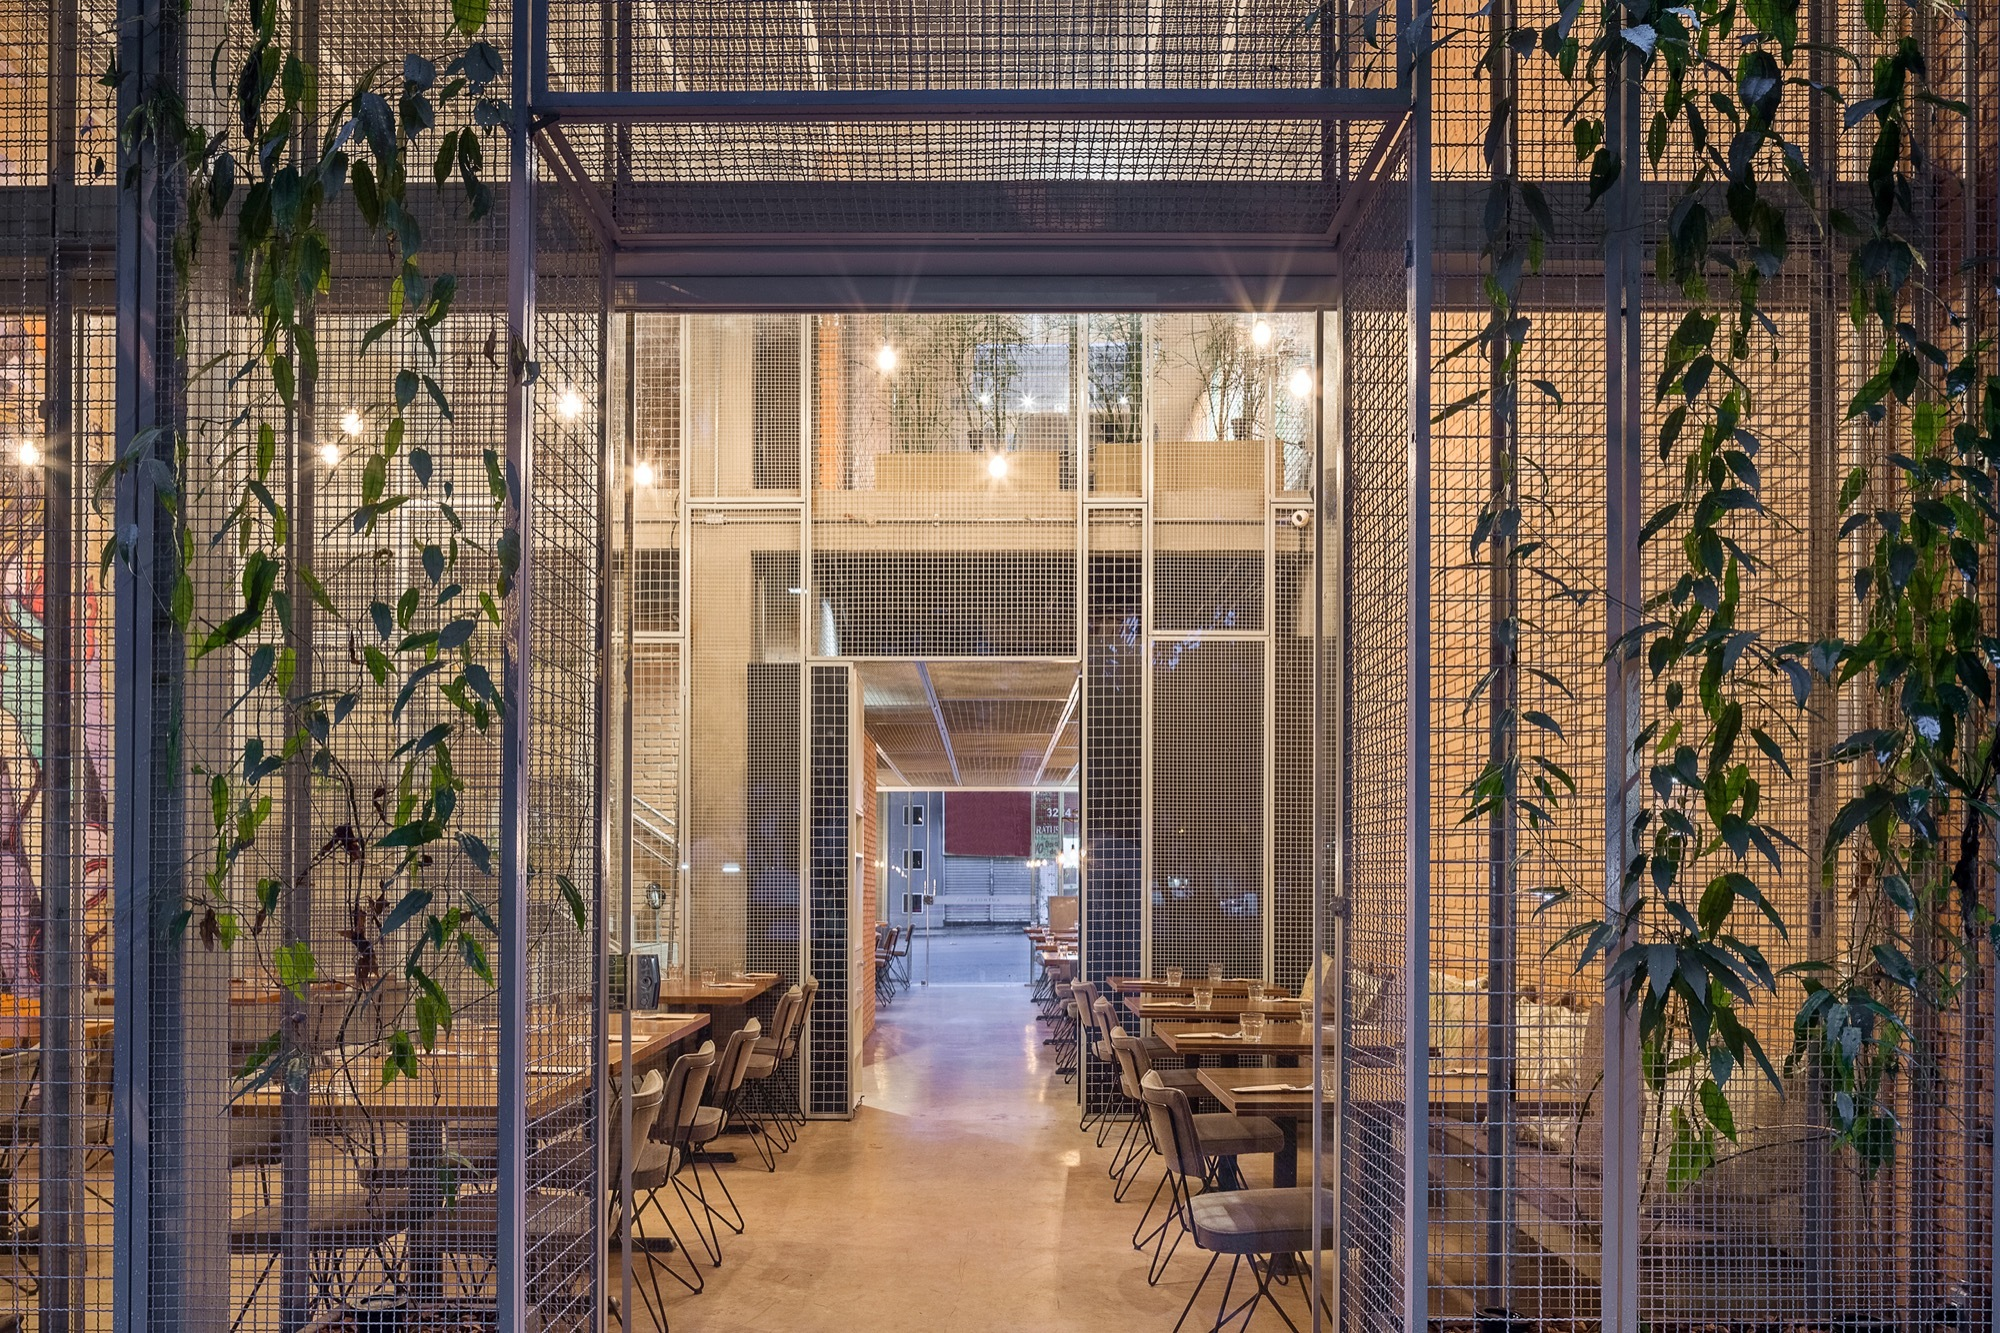 Restaurante Authoral Bloco Arquitetos Archdaily Brasil